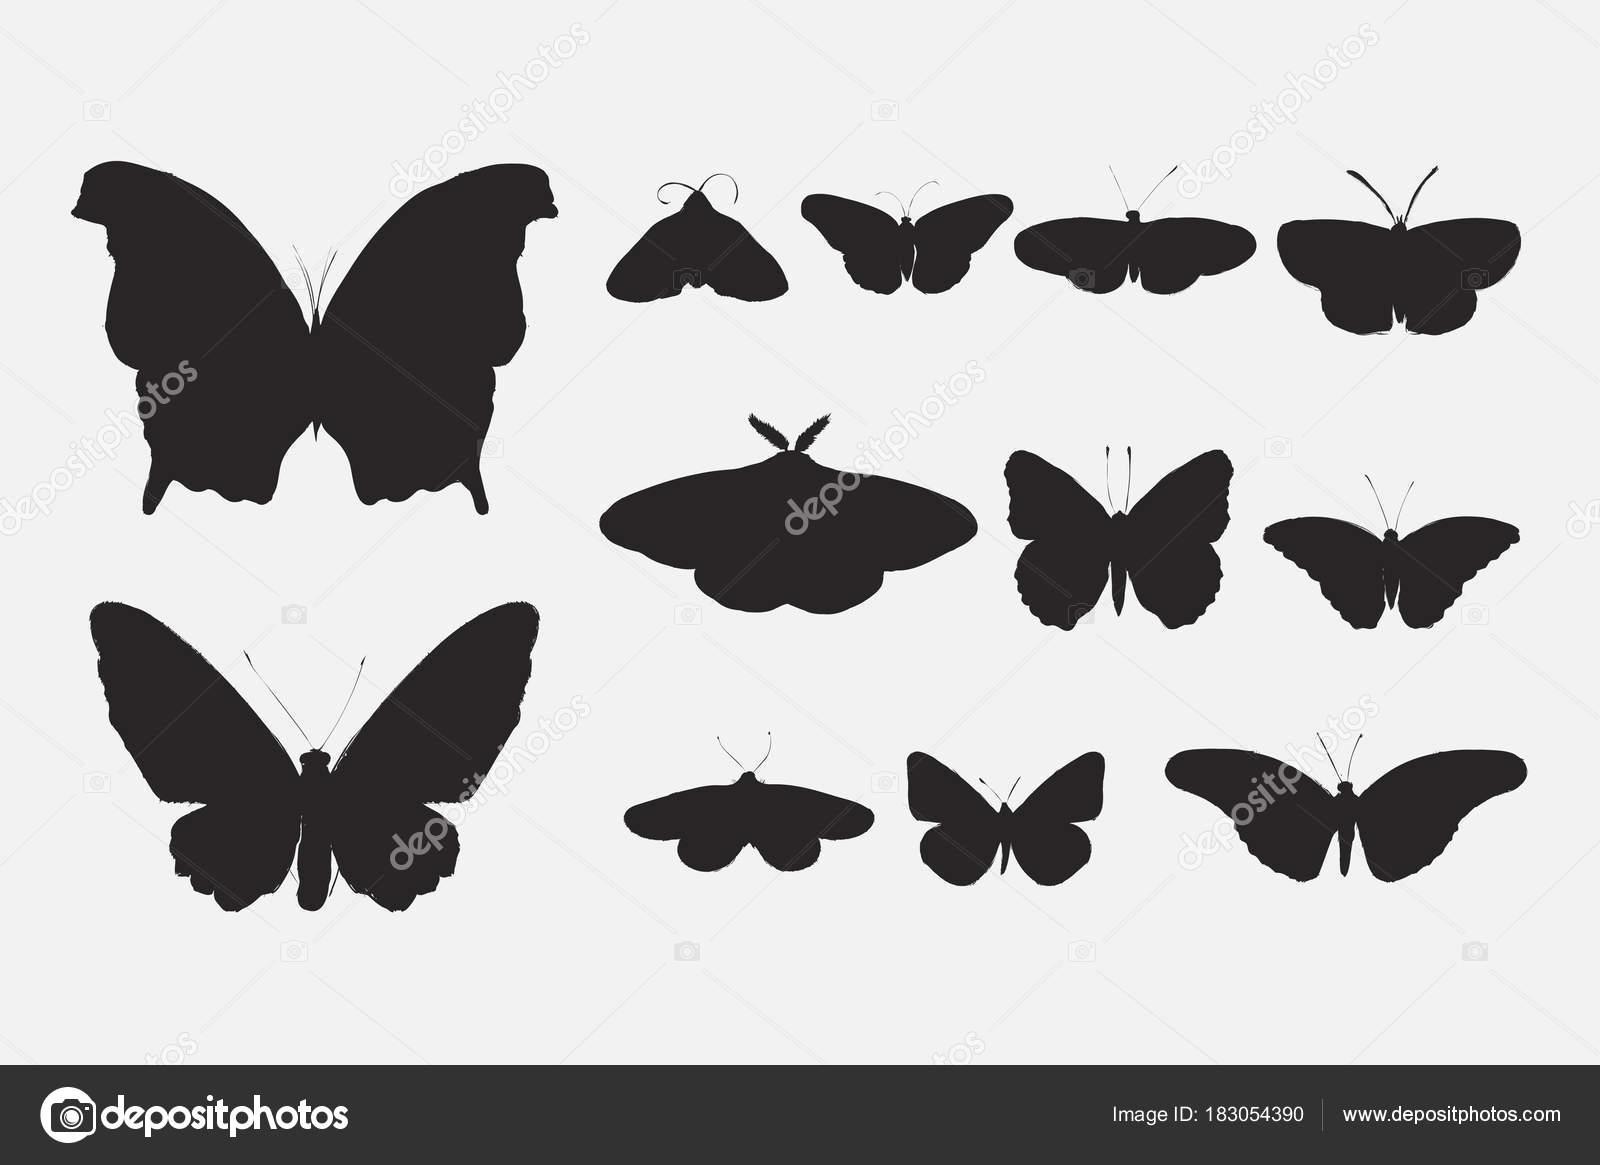 Ilustrace Kresba Styl Sbirku Motylu Stock Fotografie C Rawpixel